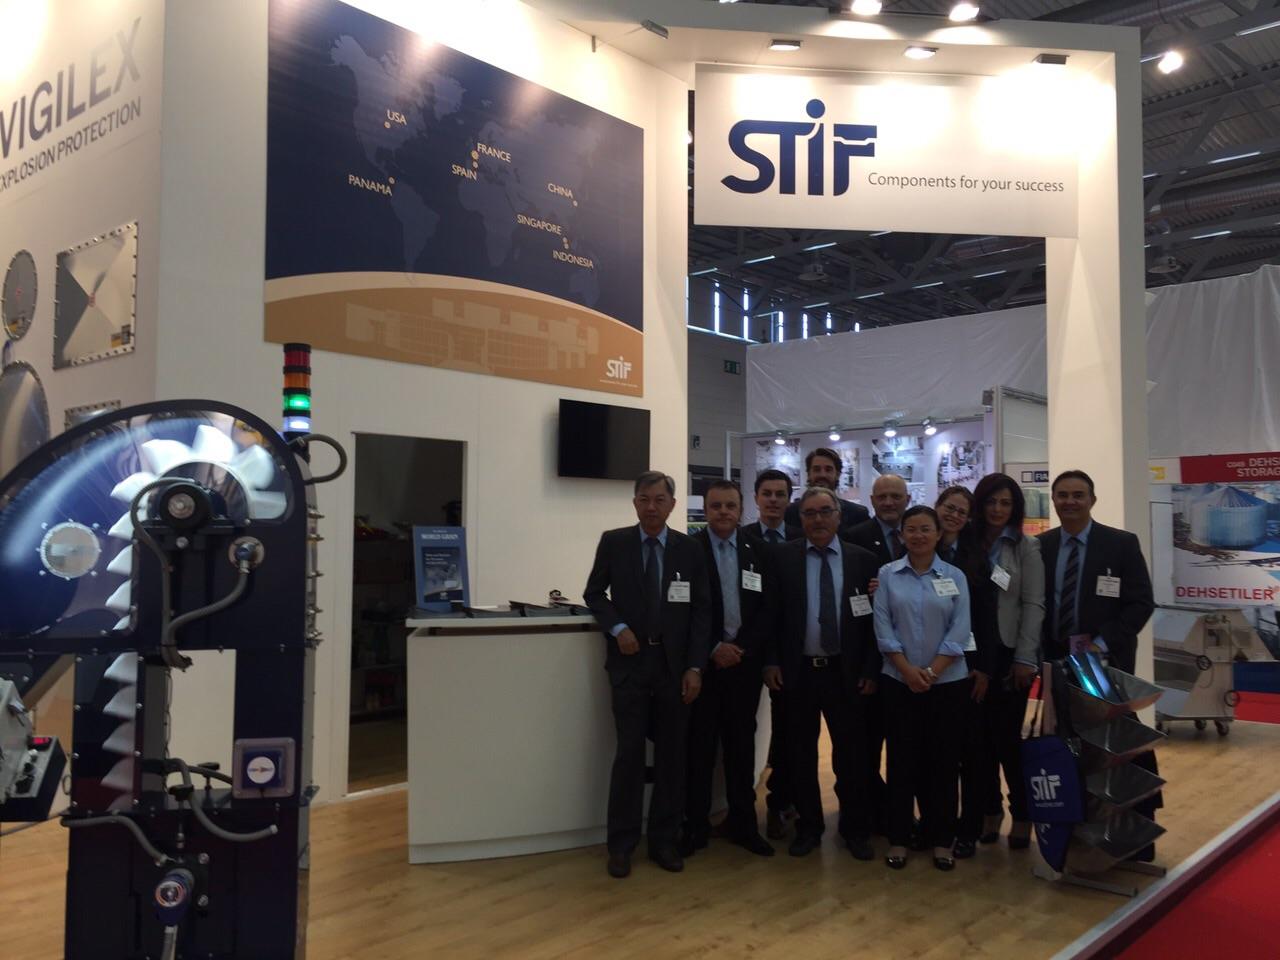 Multimedia Stif